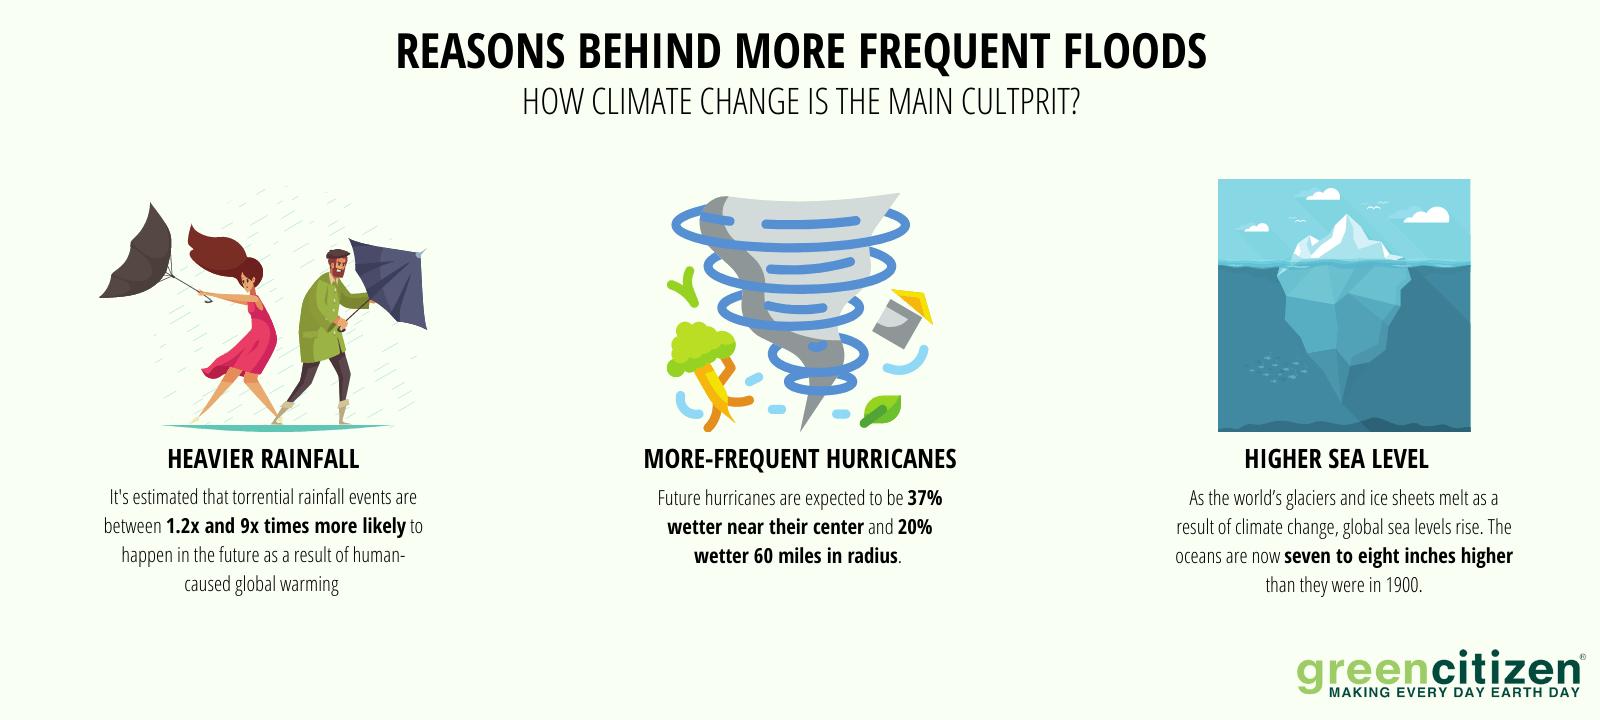 how to prepapre for floods floodsafety